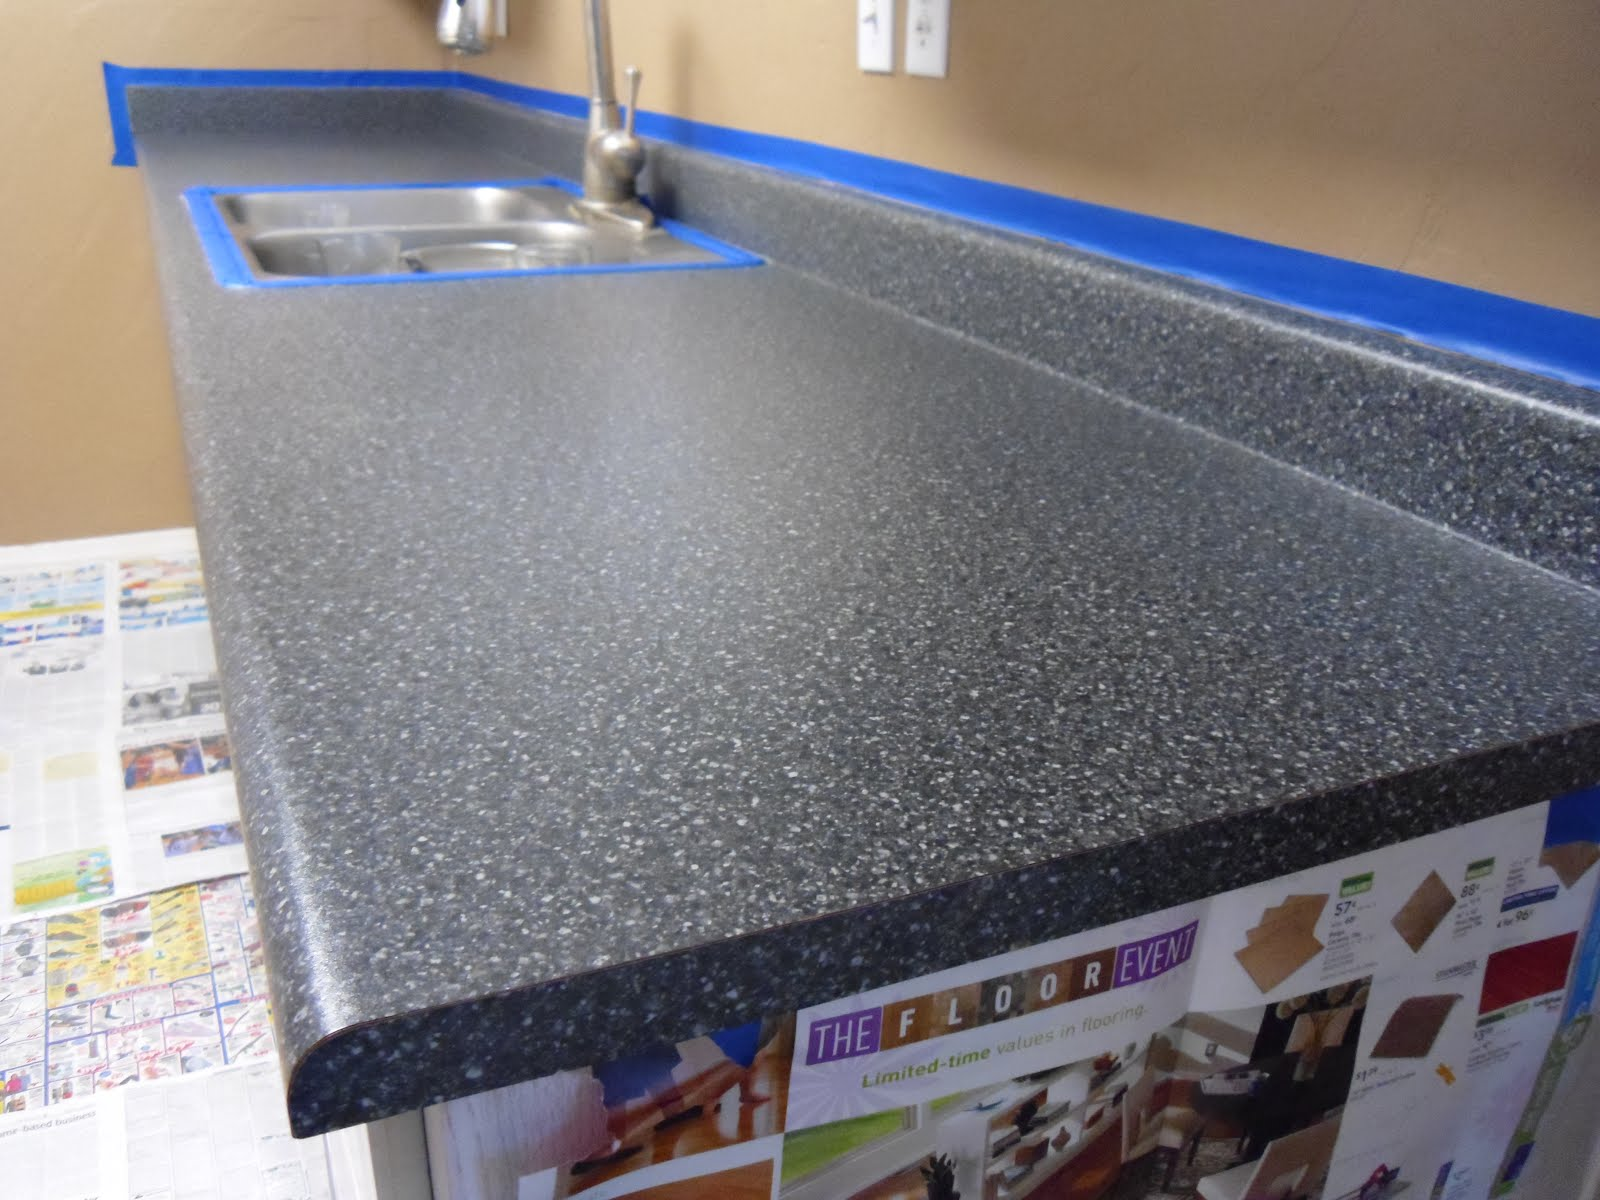 home depot countertop sale home depot kitchen countertops Faux Granite Countertops Home Depot